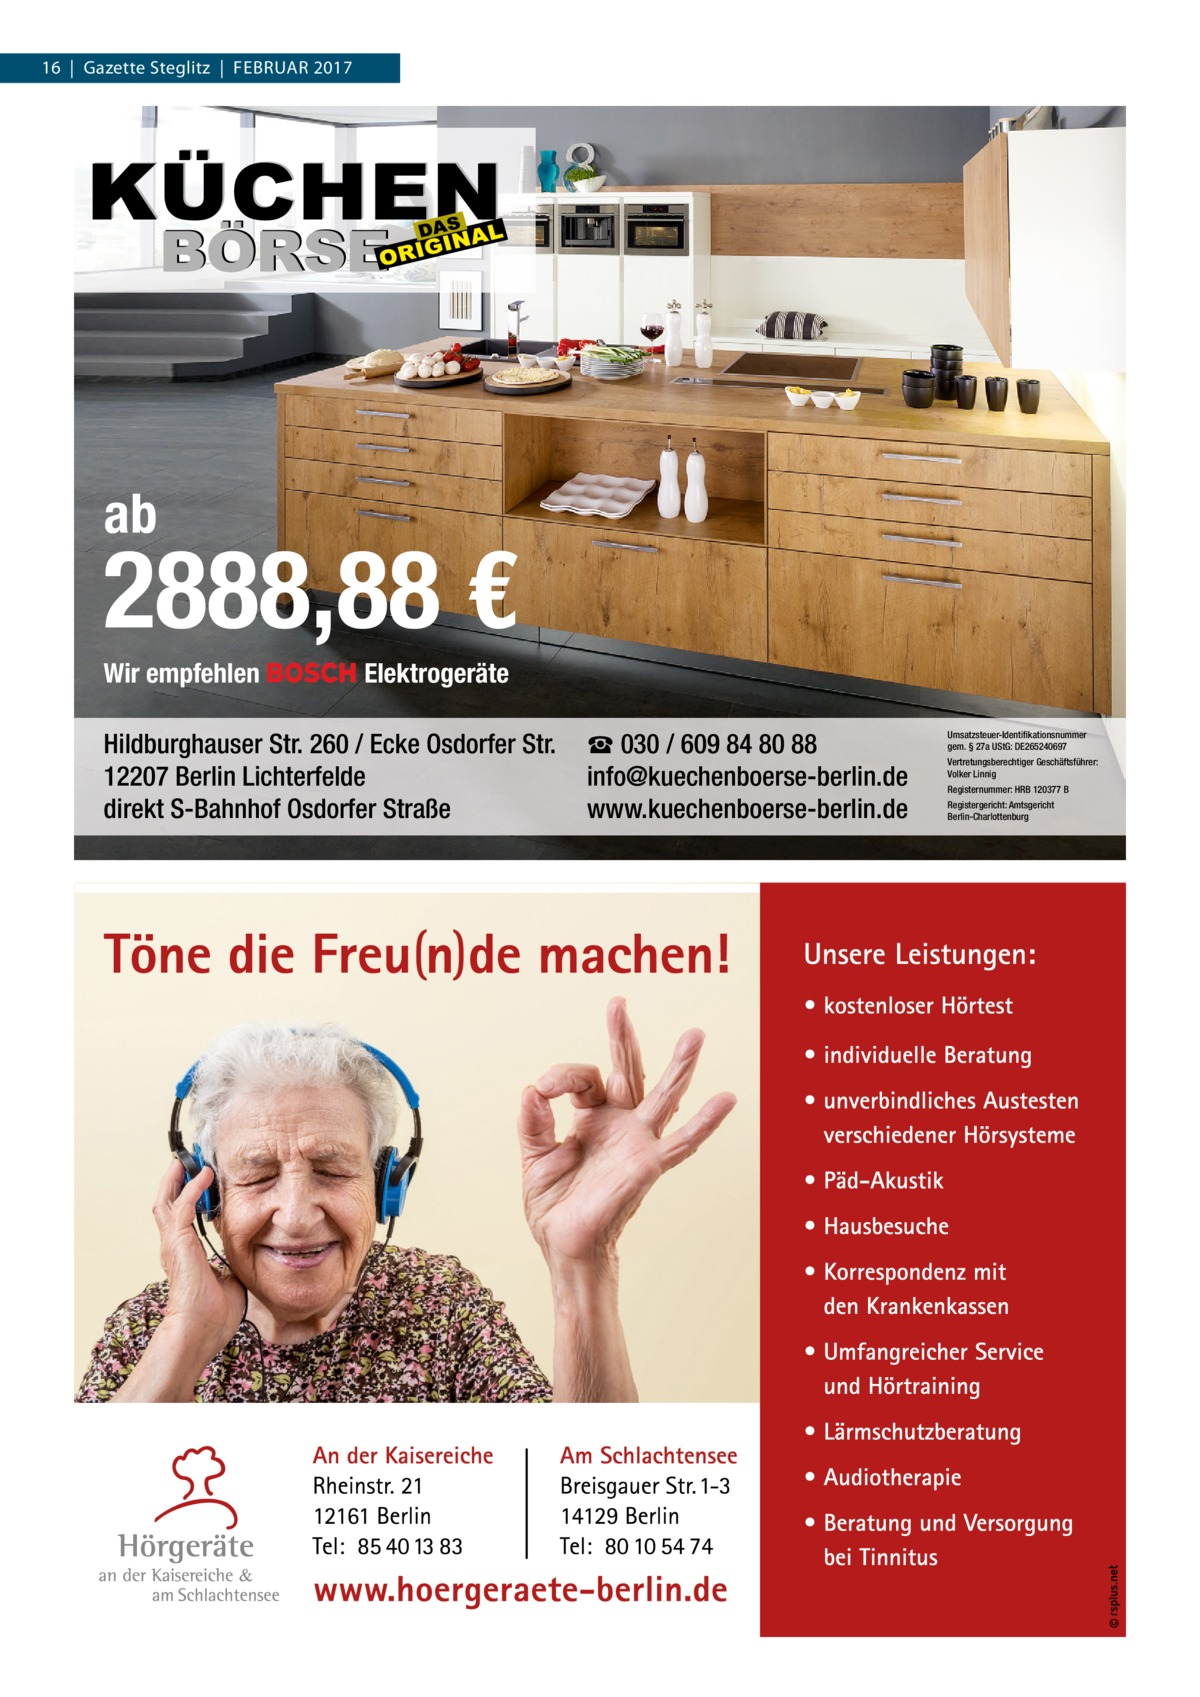 16 Gazette Steglitz Februar 2017  ab  2888,88 € Wir empfehlen  Elektrogeräte  Hildburghauser Str. 260 / Ecke Osdorfer Str. 12207 Berlin Lichterfelde direkt S-Bahnhof Osdorfer Straße  ☎ 030 / 609 84 80 88 info@kuechenboerse-berlin.de www.kuechenboerse-berlin.de  Umsatzsteuer-Identifikationsnummer gem. § 27a UStG: DE265240697 Vertretungsberechtiger Geschäftsführer: Volker Linnig Registernummer: HRB 120377 B Registergericht: Amtsgericht Berlin-Charlottenburg